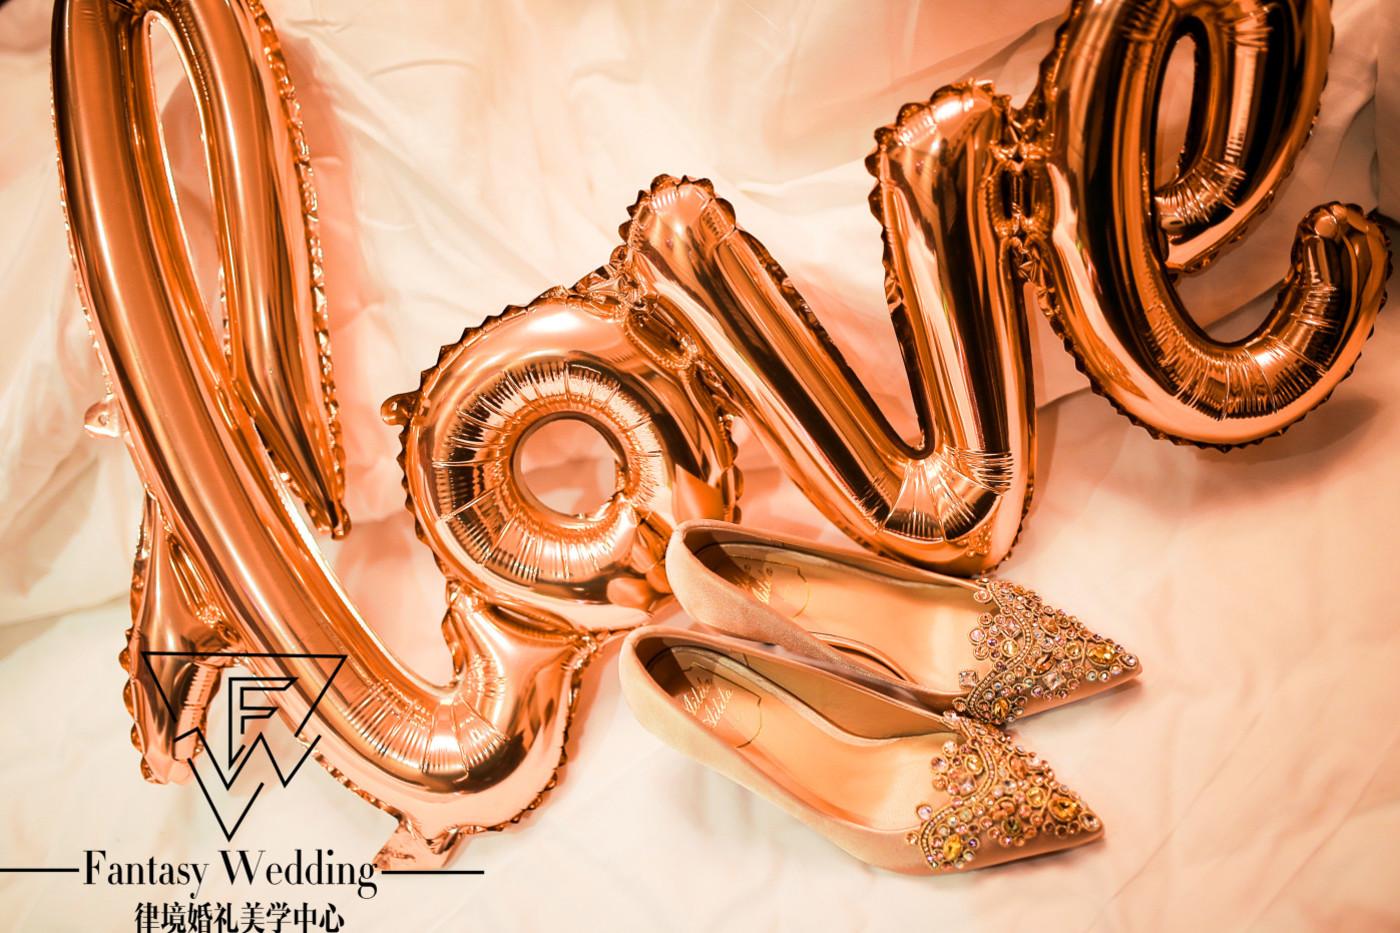 「Fantasy Wedding」& A/P 南艳湖0